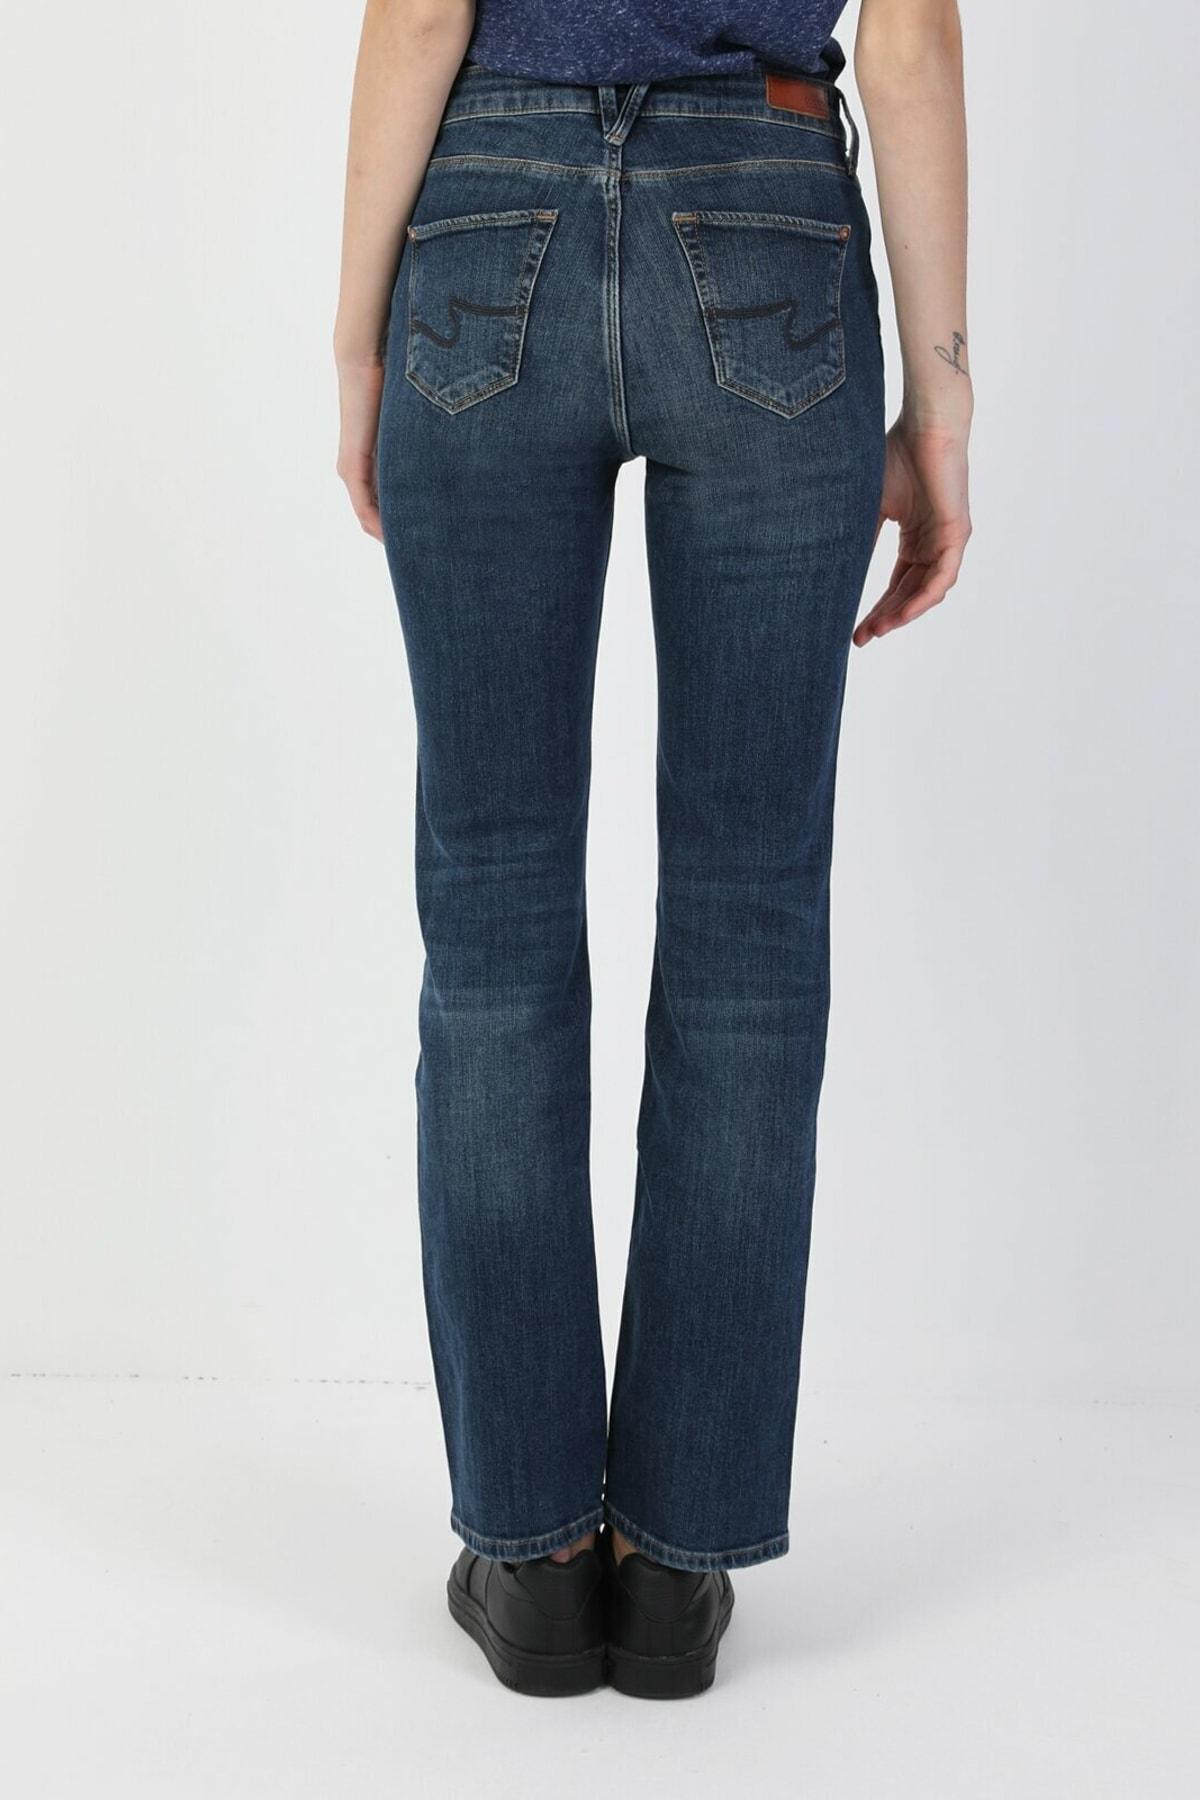 Colin's 792 Mila Normal Kesim Normal Bel Düz Paça Mavi Kadın Pantolon CL1048932 2